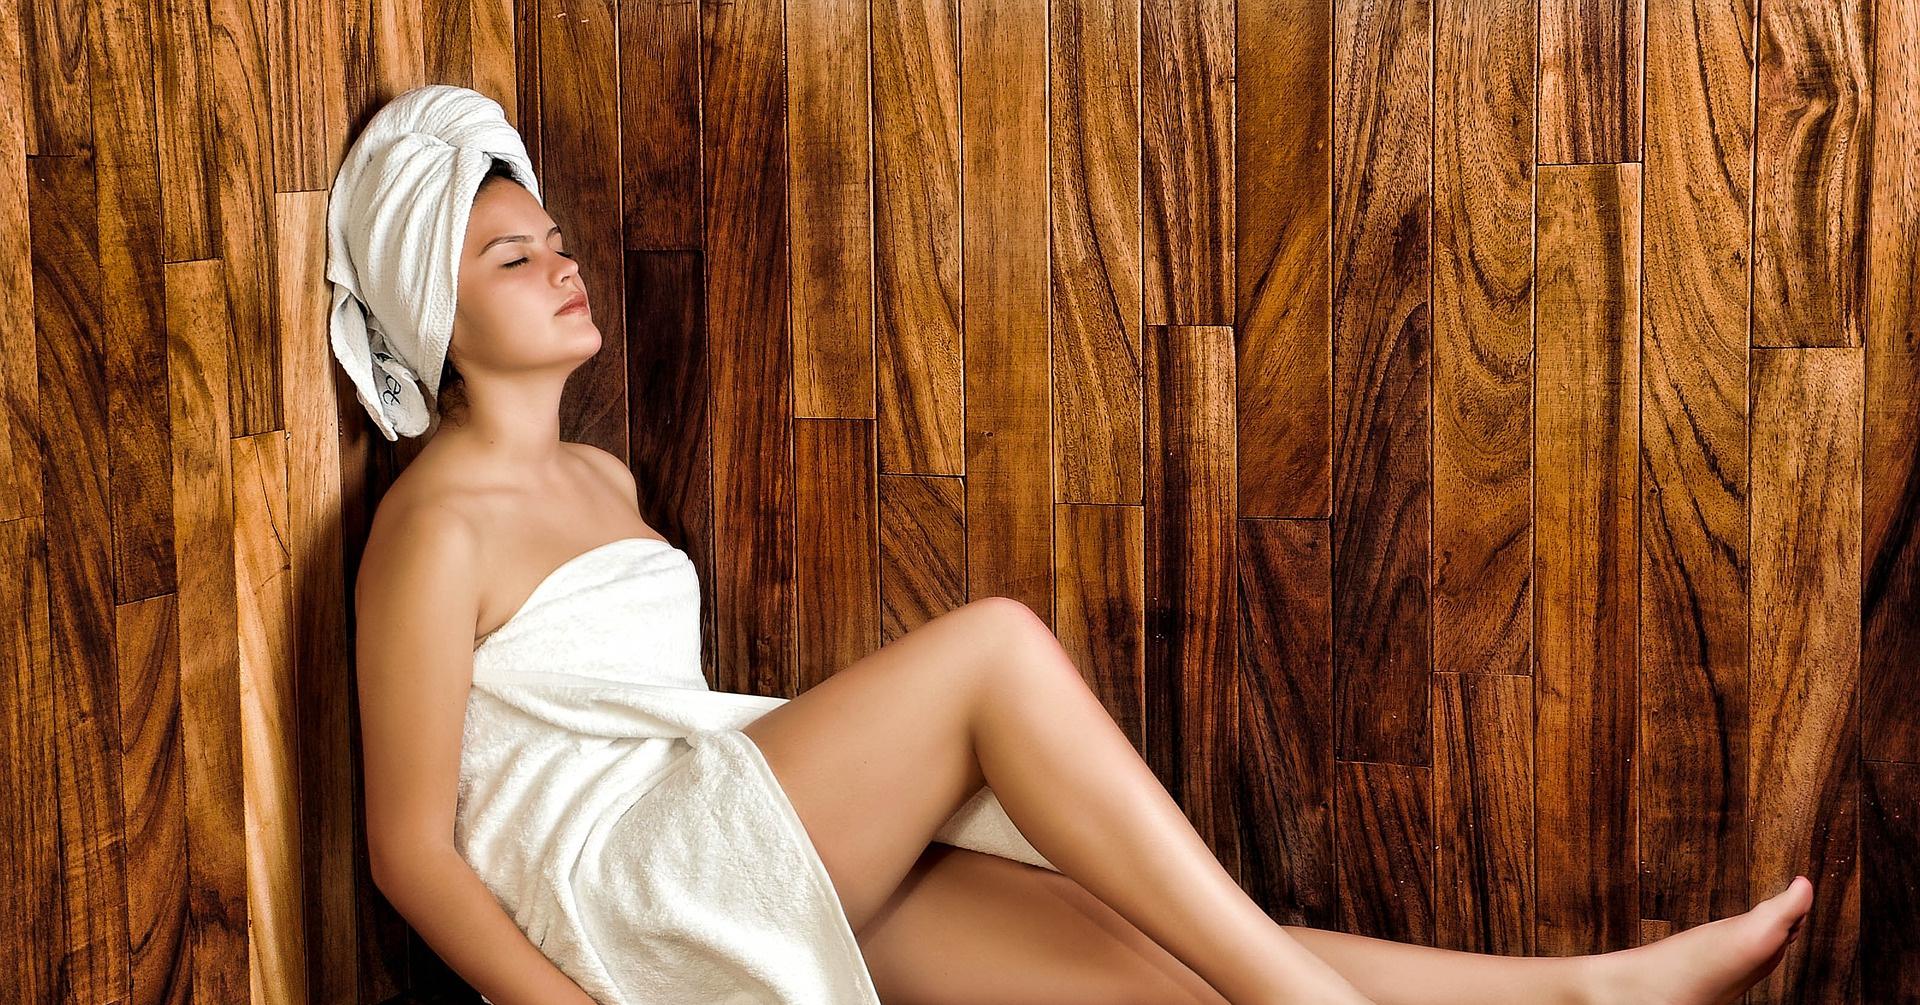 Фото девушка в сауне, Фото девушек из бани личное ВК - без нечего в сауне 7 фотография